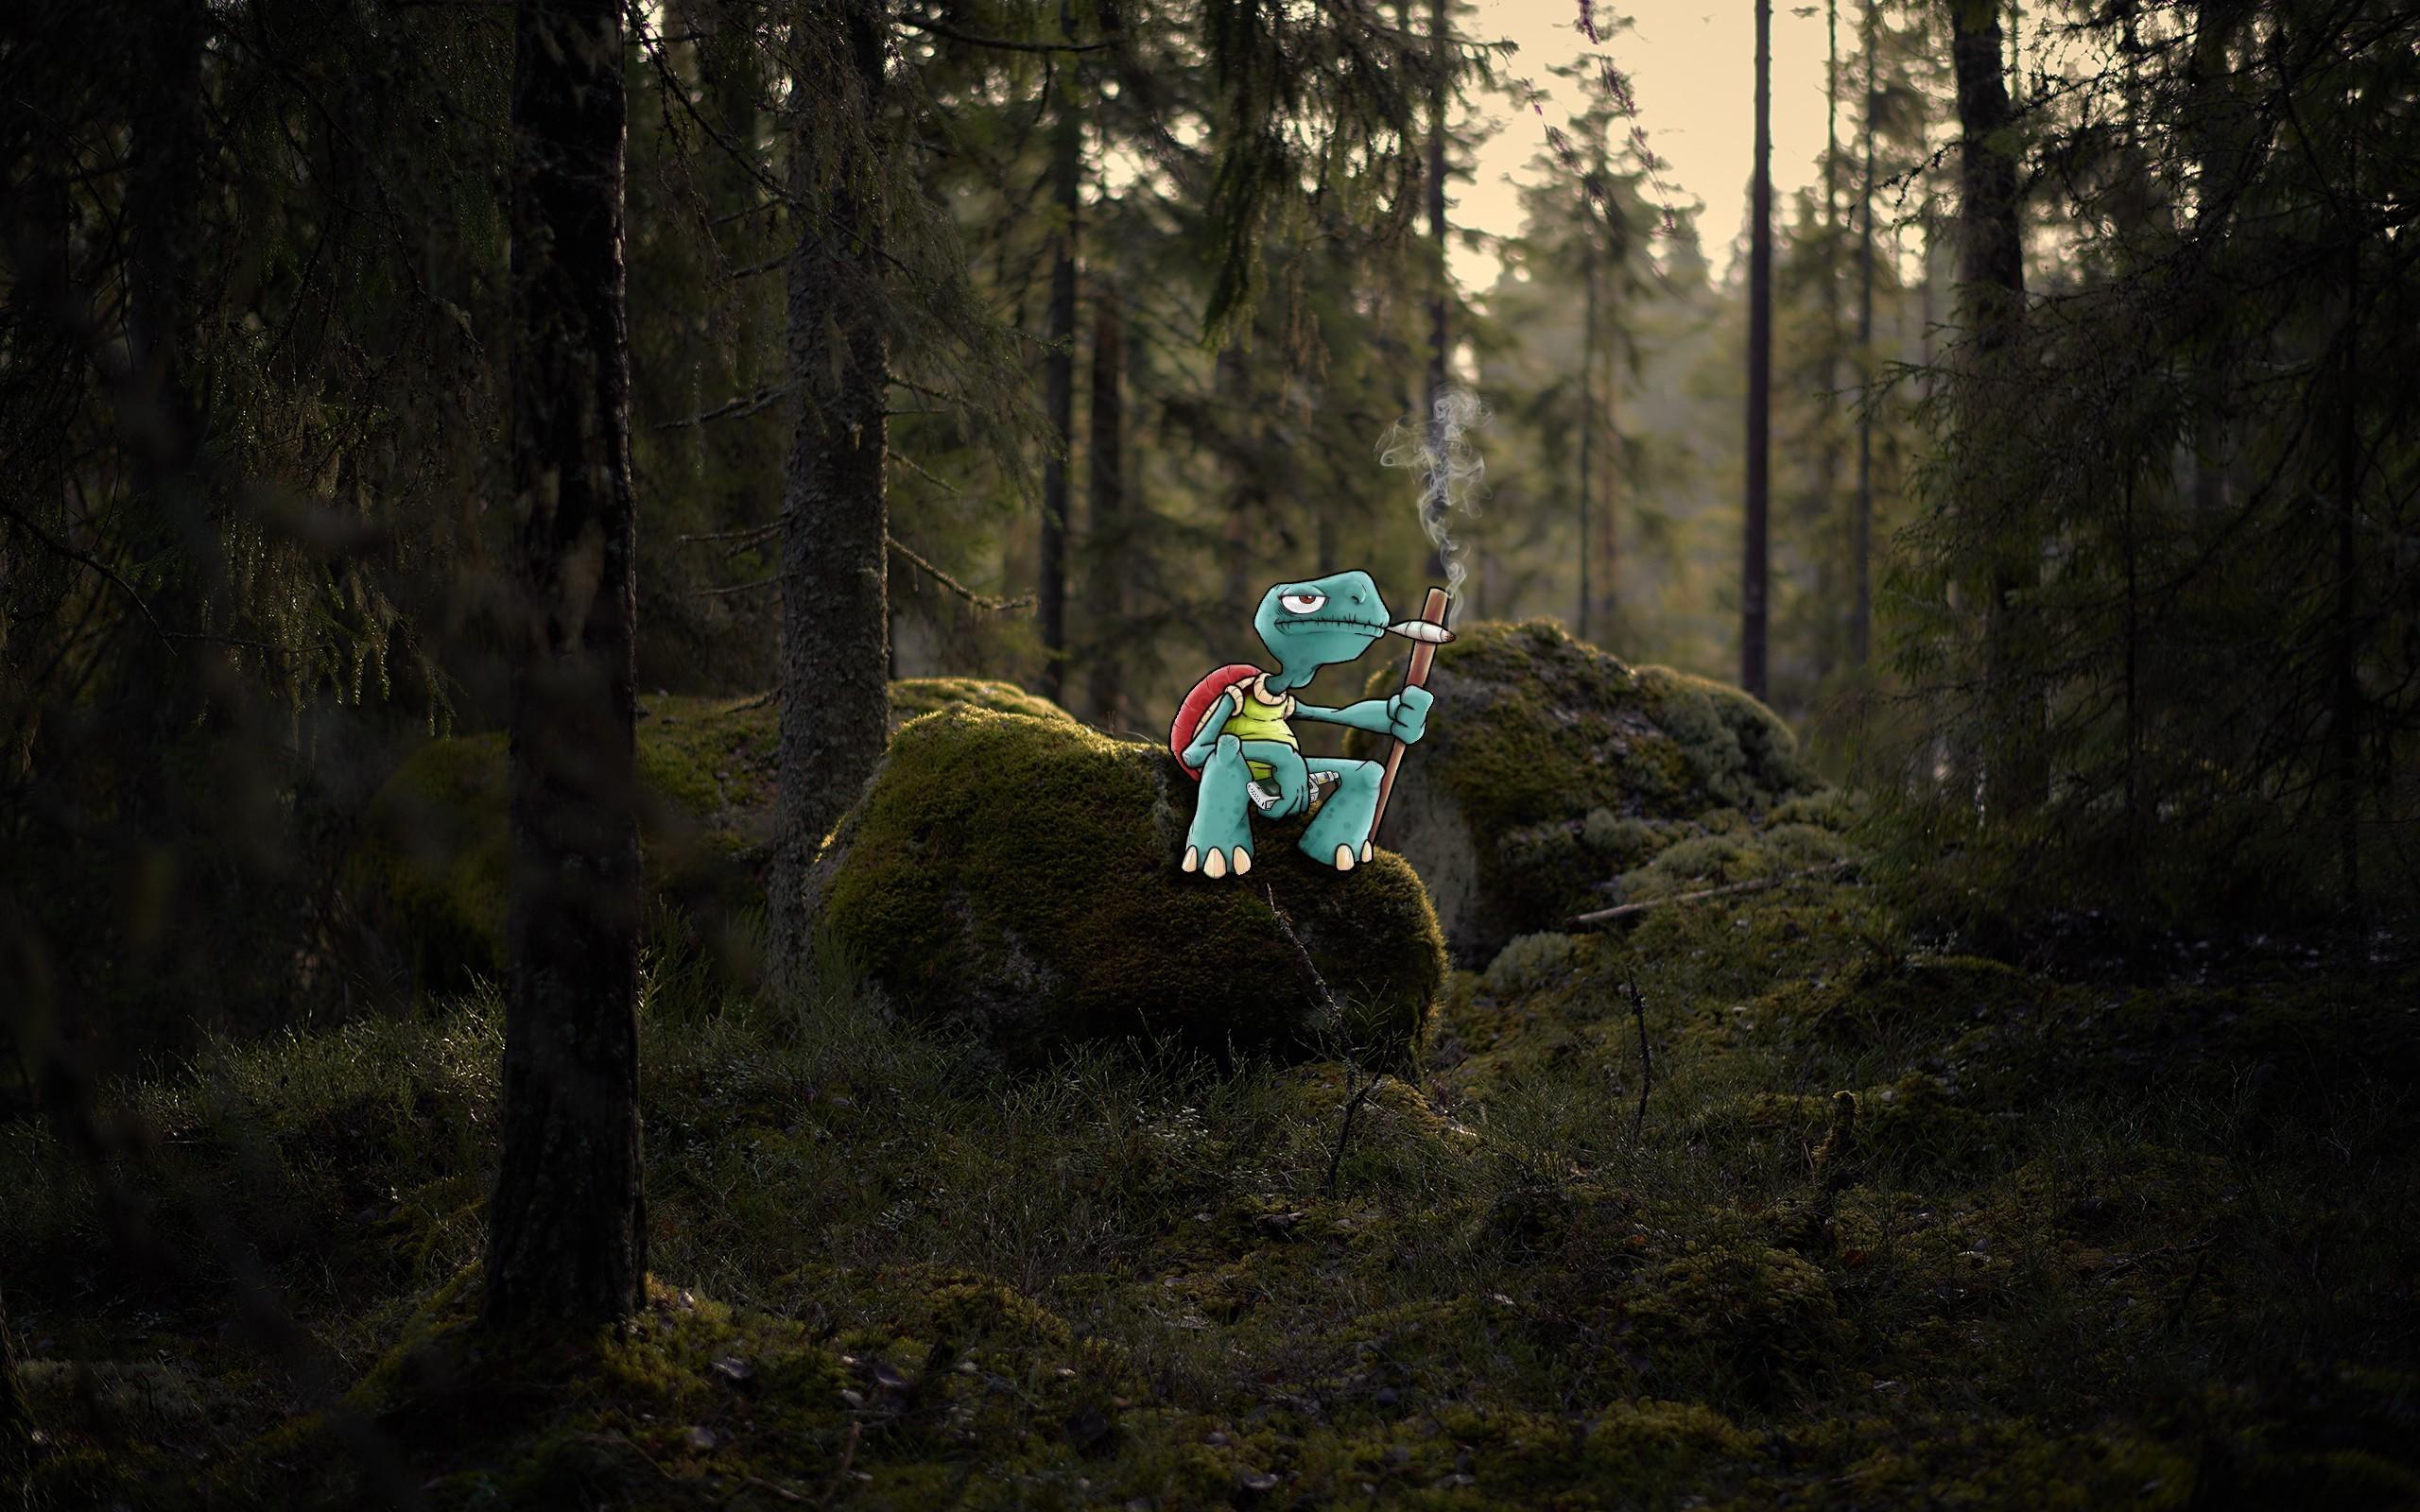 General 2560x1600 tortoises forest smoking moss green